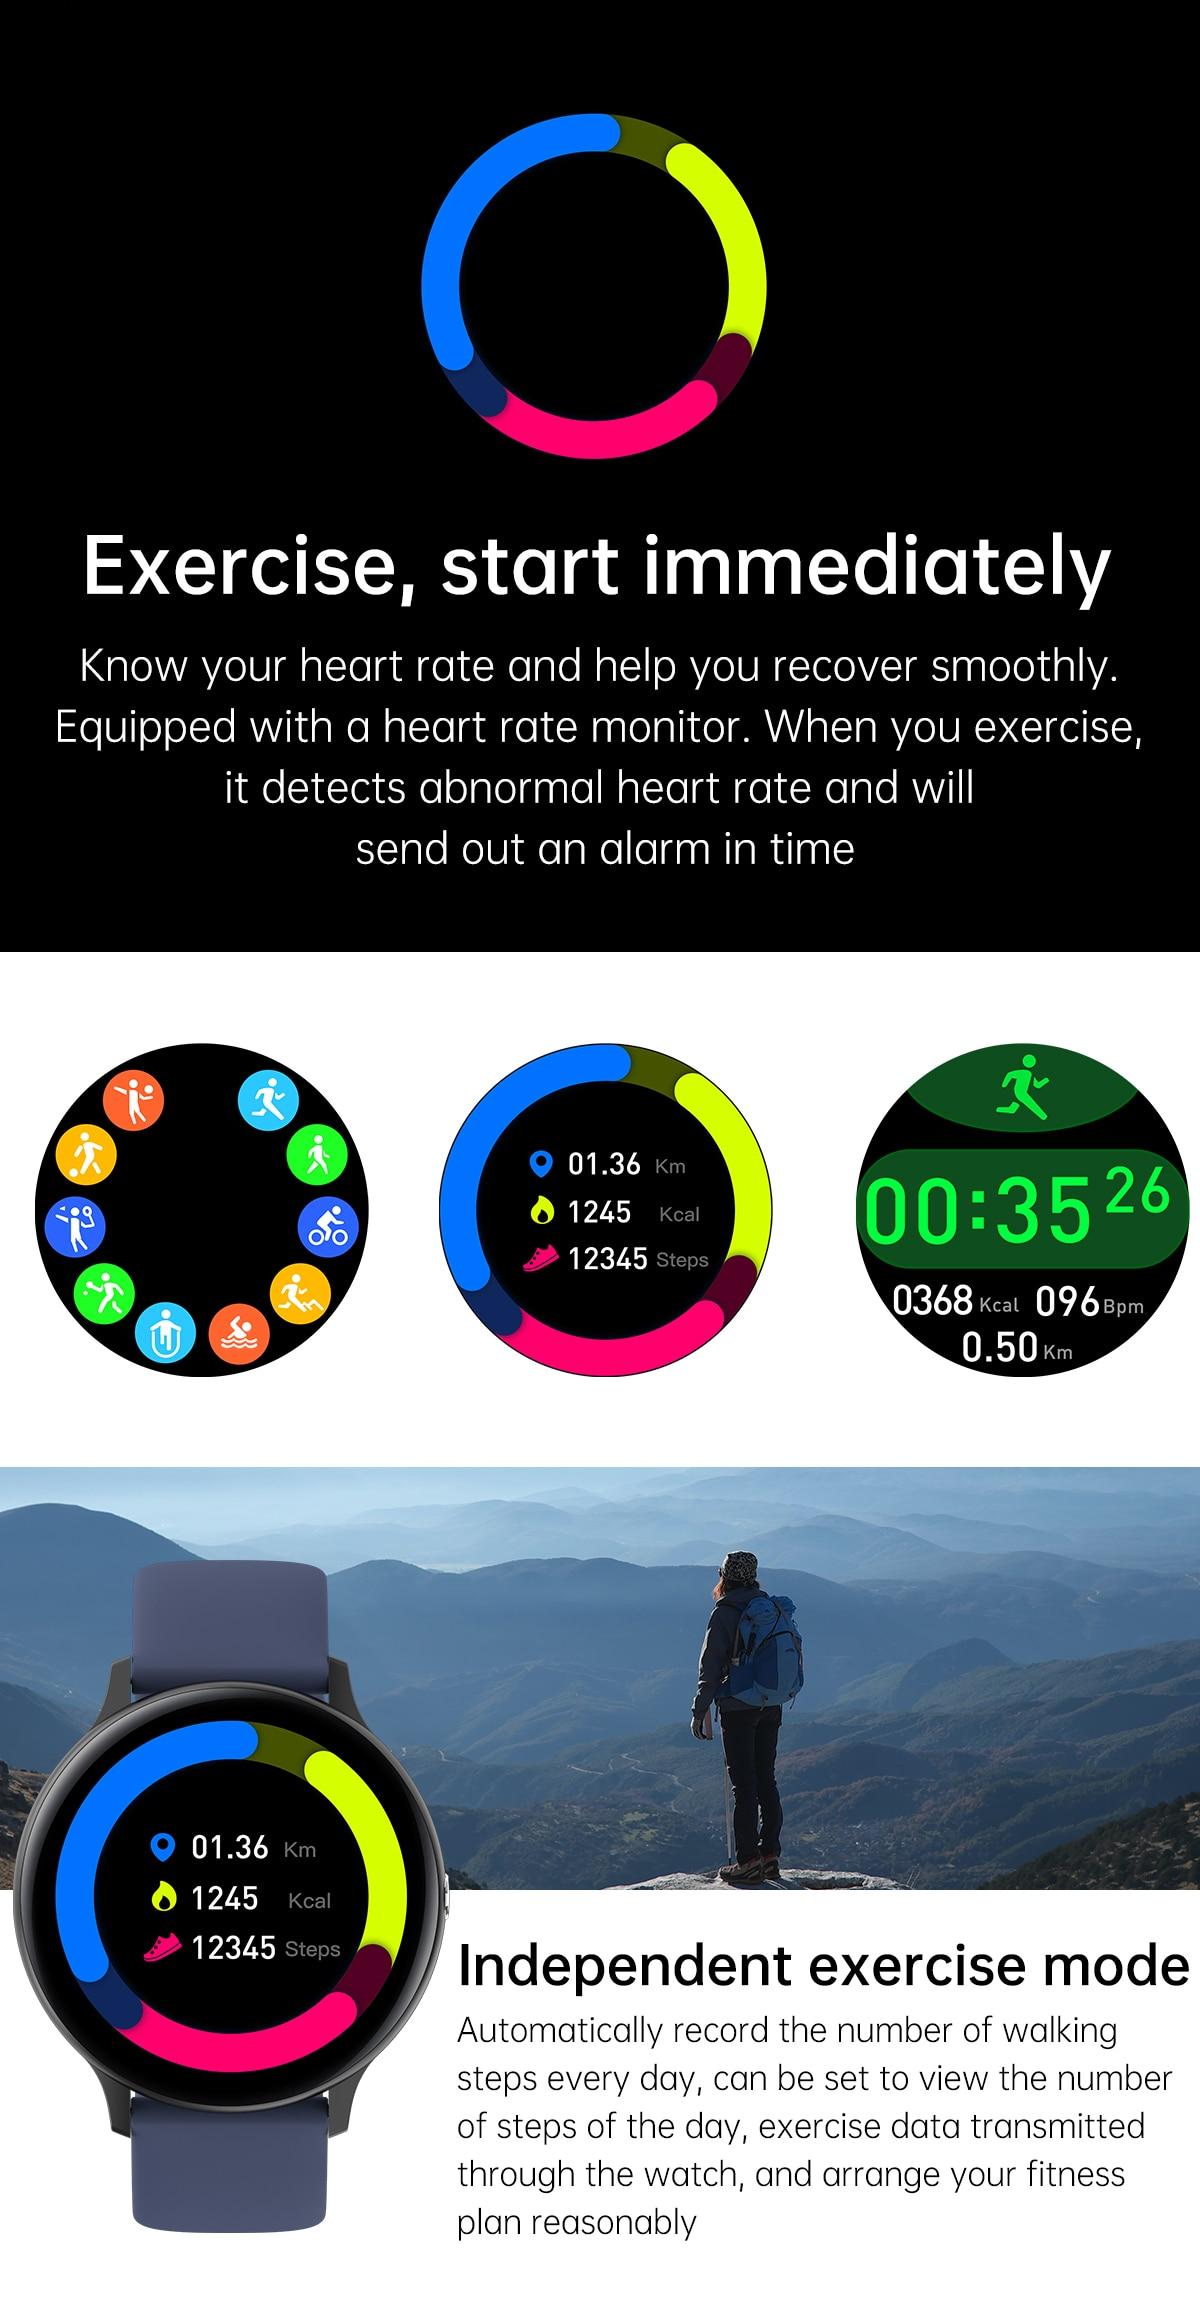 H903a63e5282a4e5bbbf09cc9bfb3ef5ck LIGE 2021 New Bluetooth call smart watch men women Sport mode Heart rate and blood pressure monitor Activity tracker Smartwatch